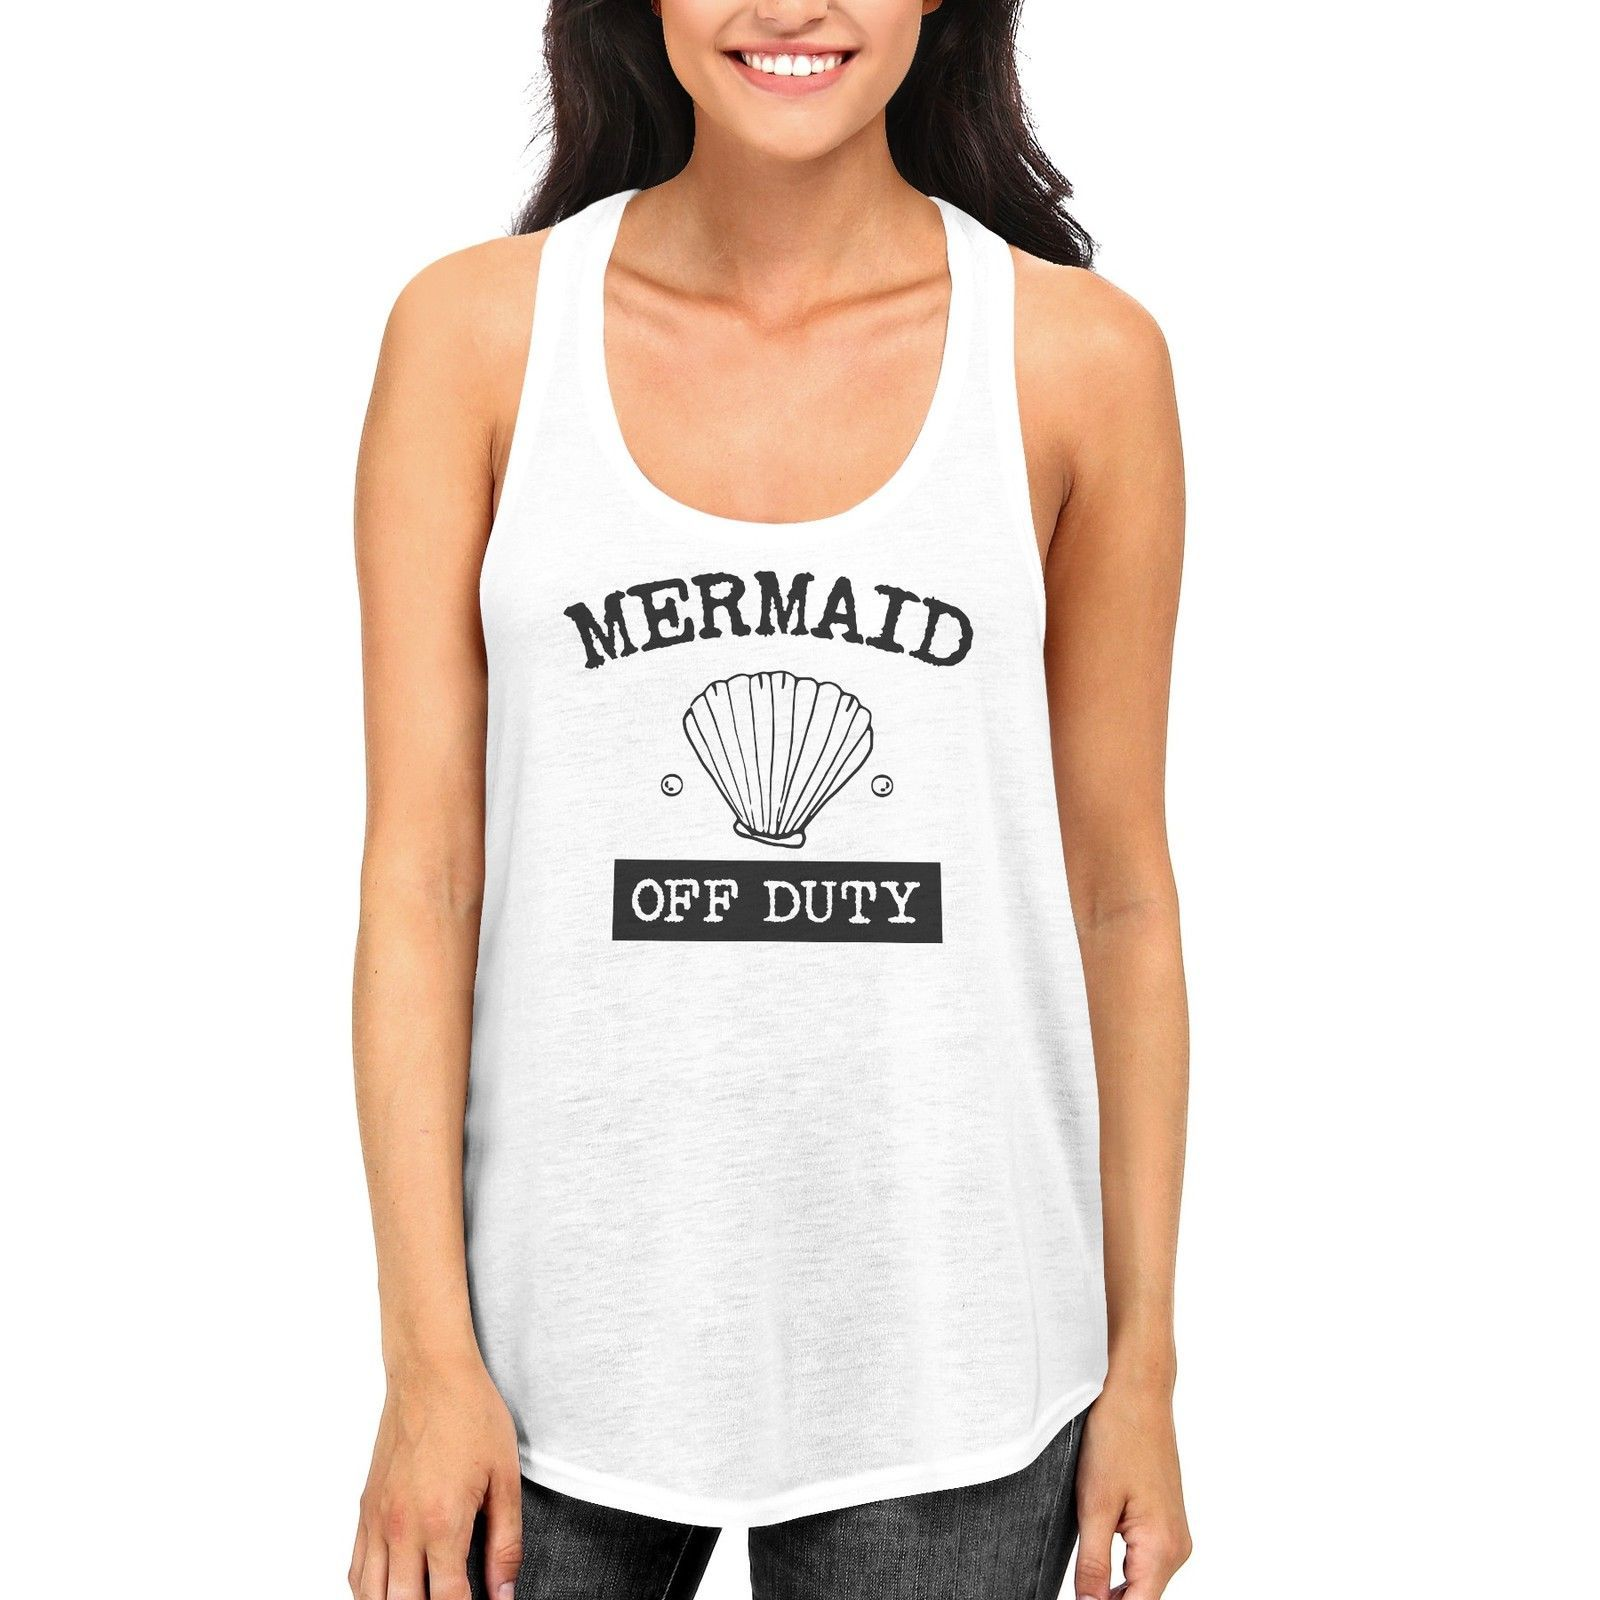 Women's Summer Mermaid Off Duty Cute Tank Top for Beach Racerback Tanks - $14.99